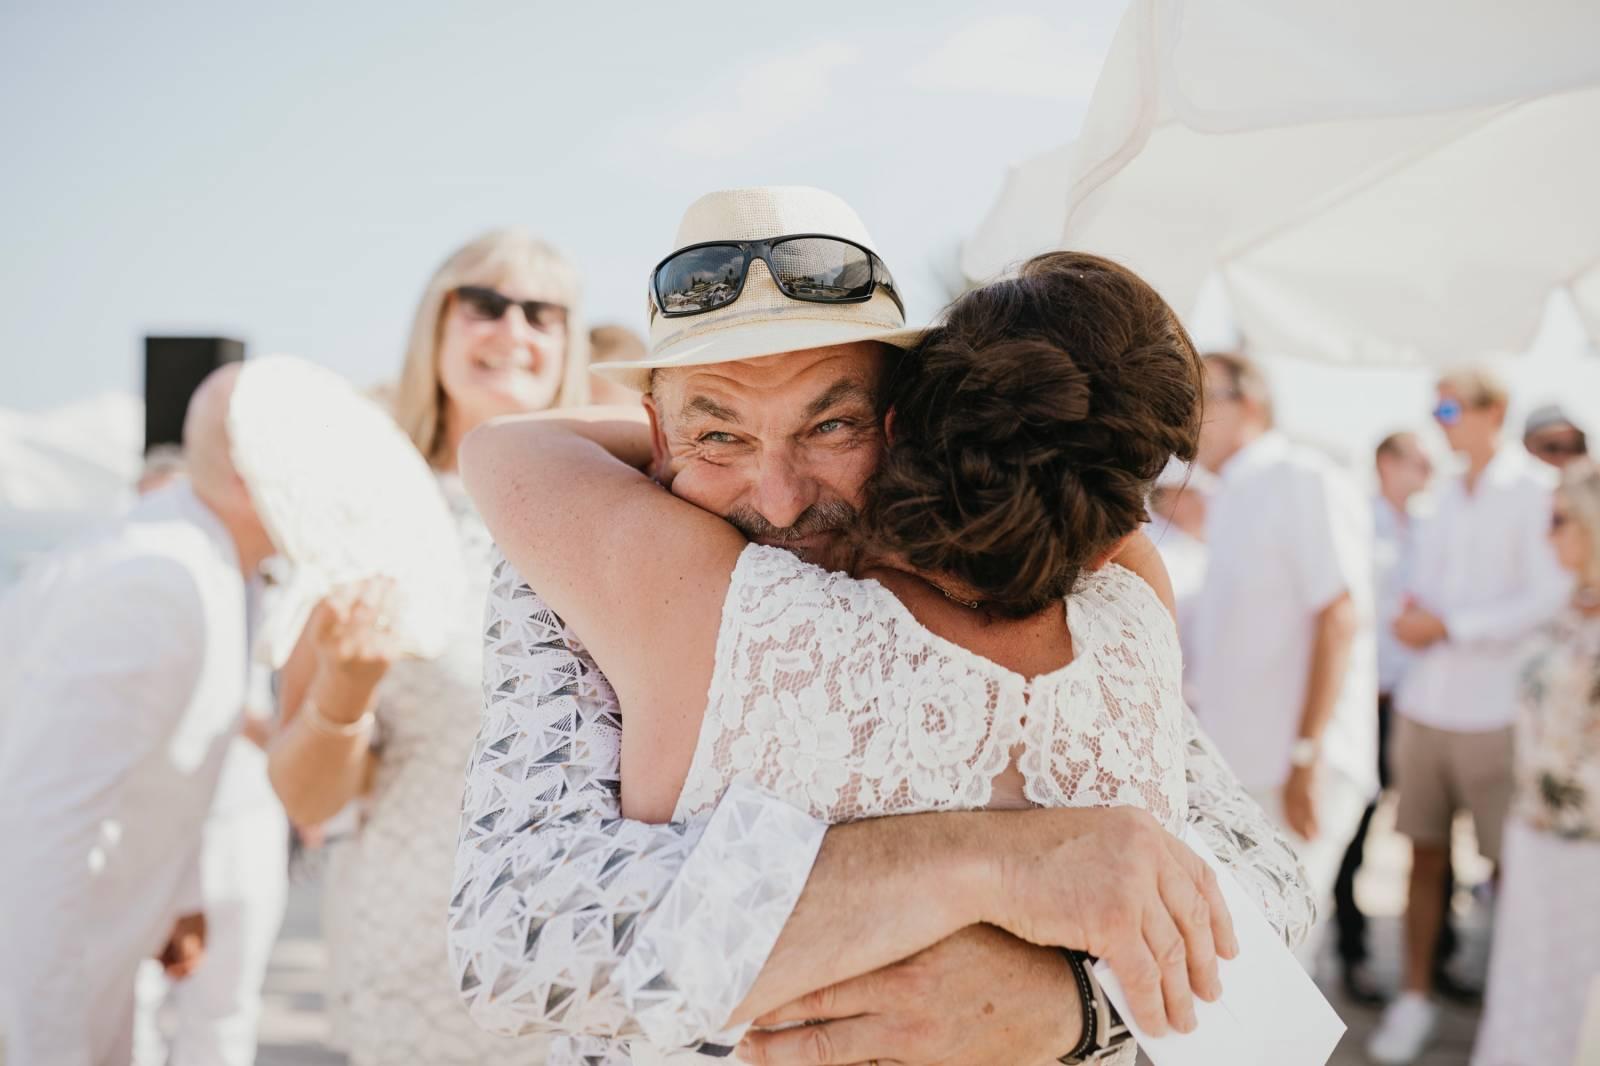 Imperish Weddings & Photography - Trouwfotograaf - Huwelijksfotograaf - Bruidsfotograaf - House of Weddings - 25